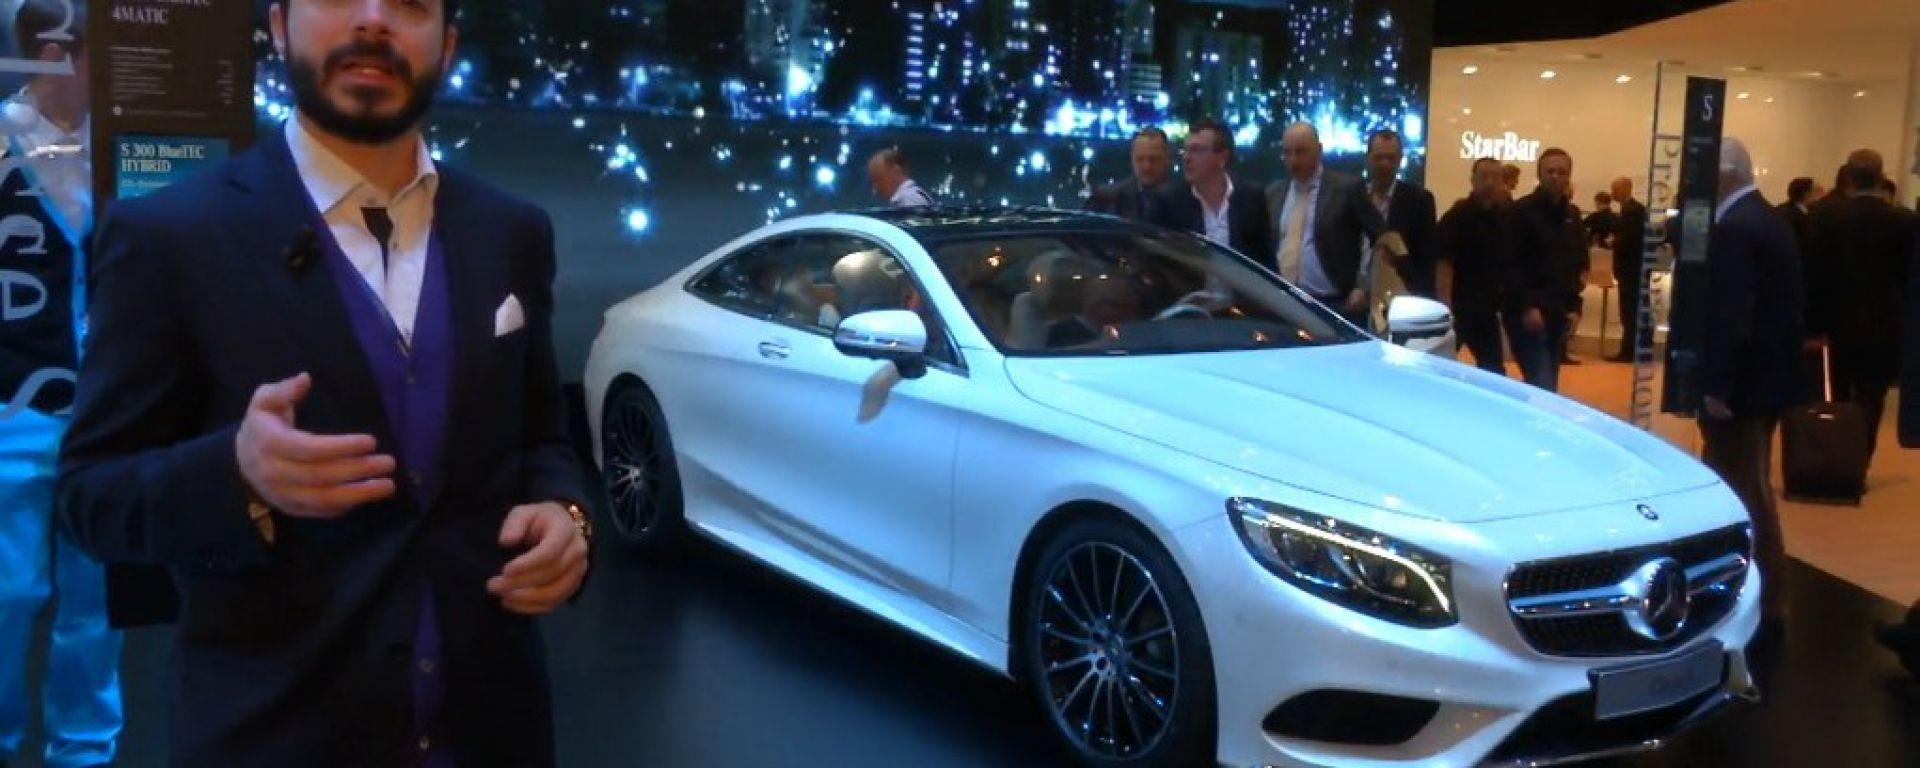 Salone di Ginevra 2014, lo stand Mercedes